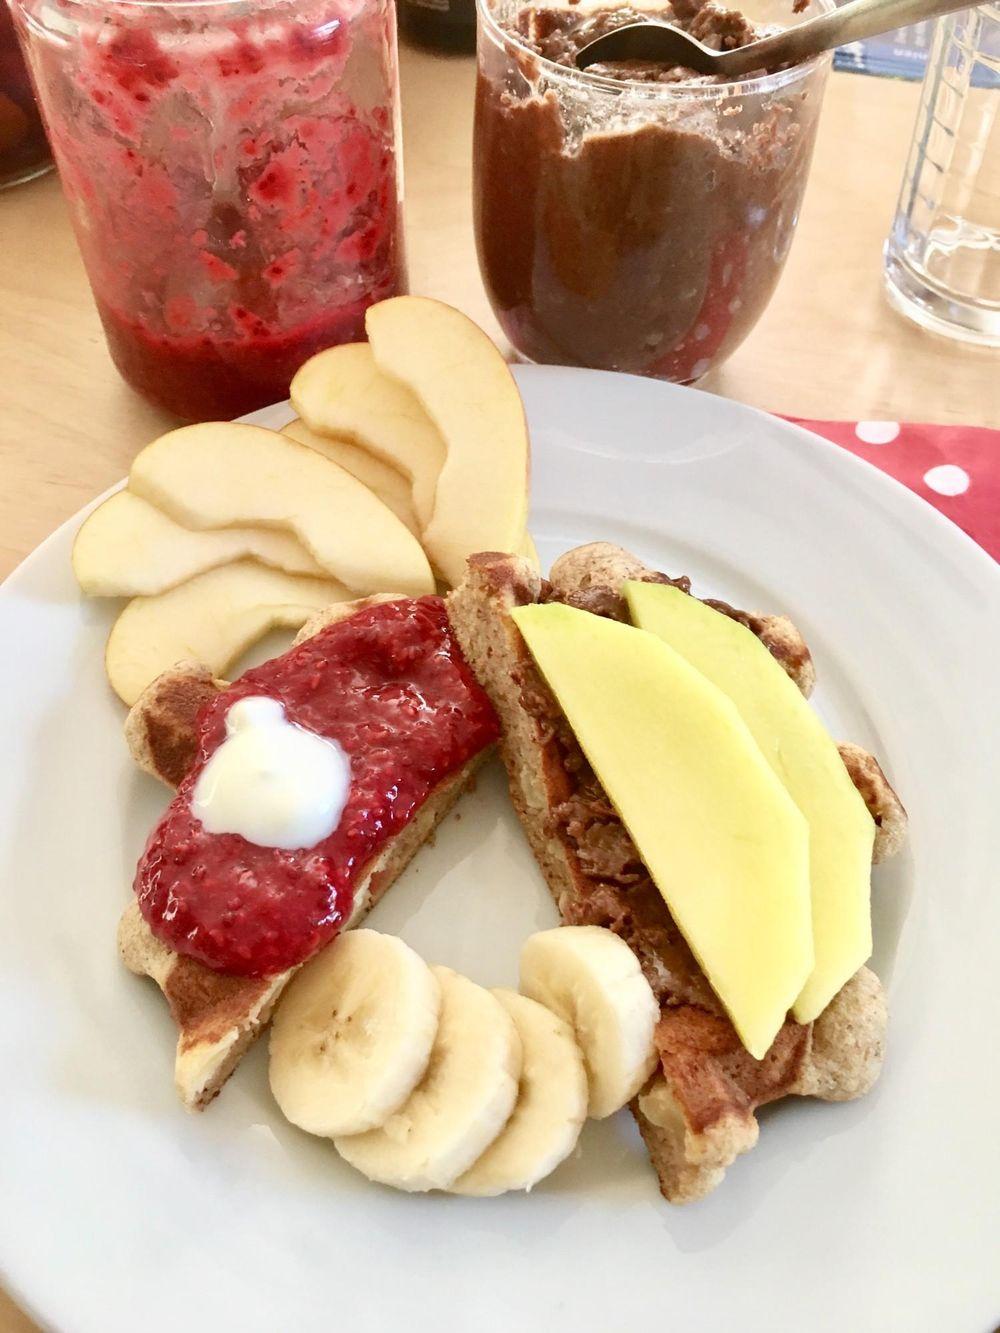 Delicious Apple Hazelnut Waffles For Weekend Breakfast  - image 1 - student project